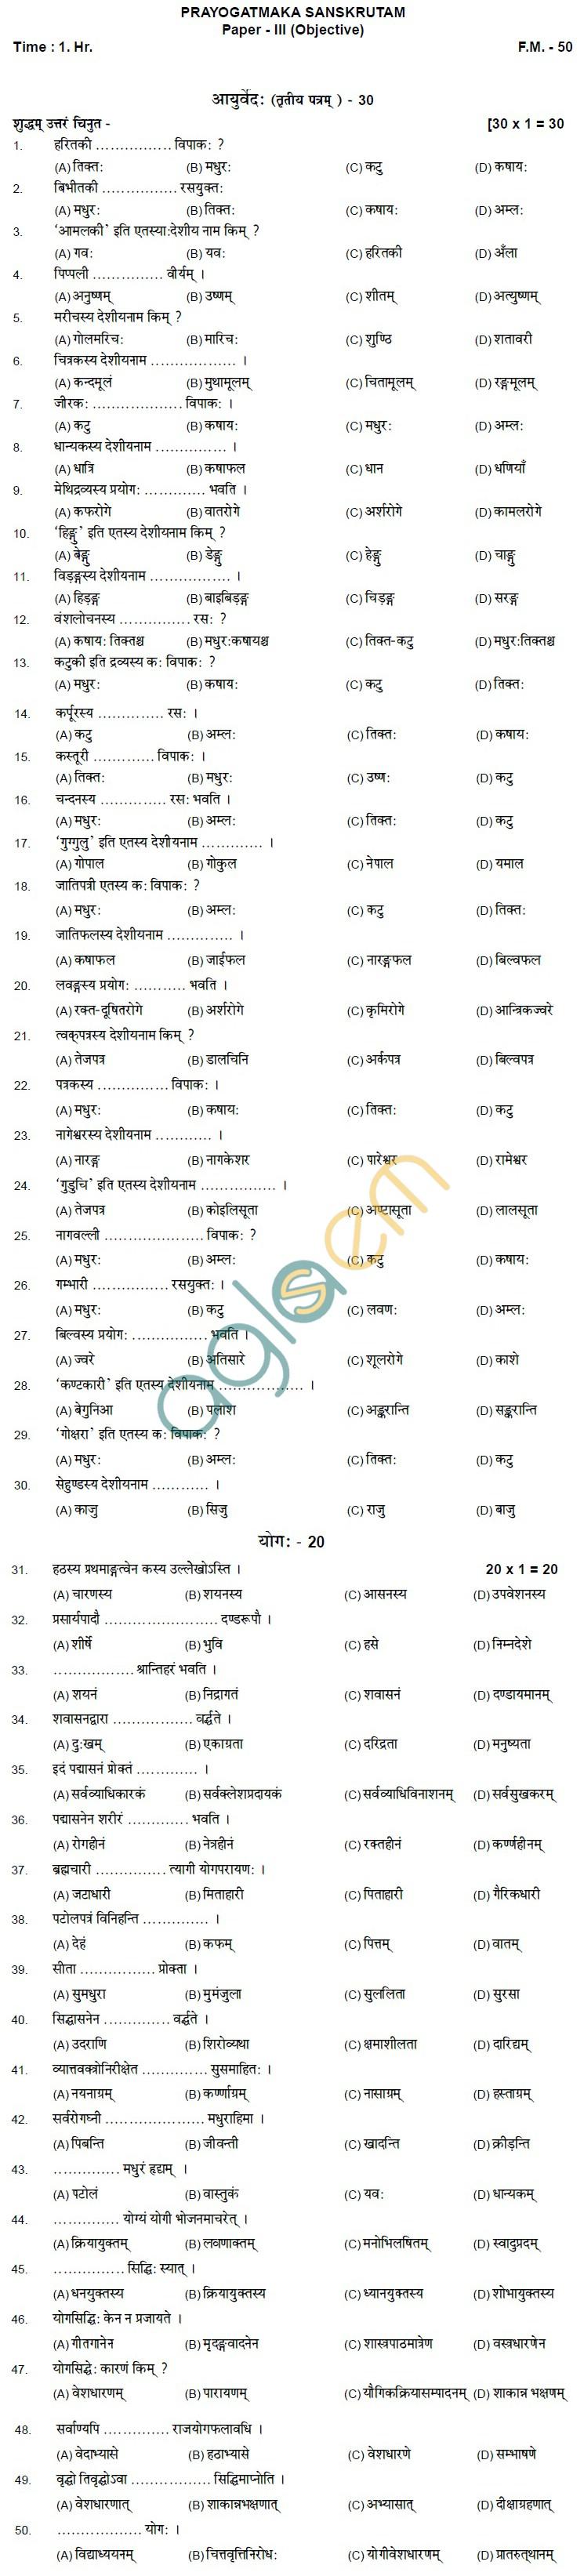 Odisha Board Sample Papers for Madhyama Sanskrit Exam 2014 - AVJ